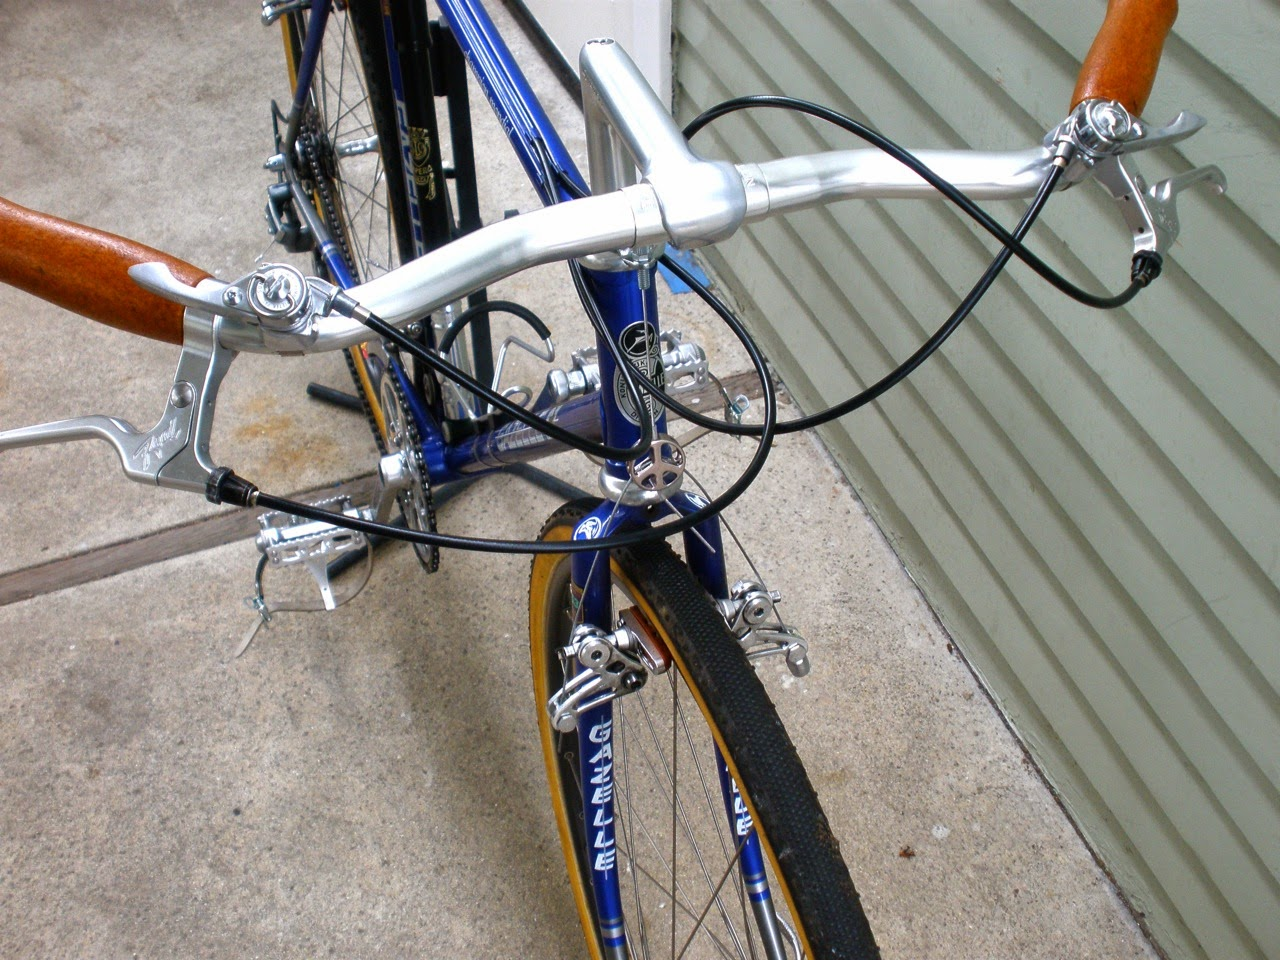 cyclocross bike, bicycle, build, Jonsan, Holland, Netherlands, Dutch, California